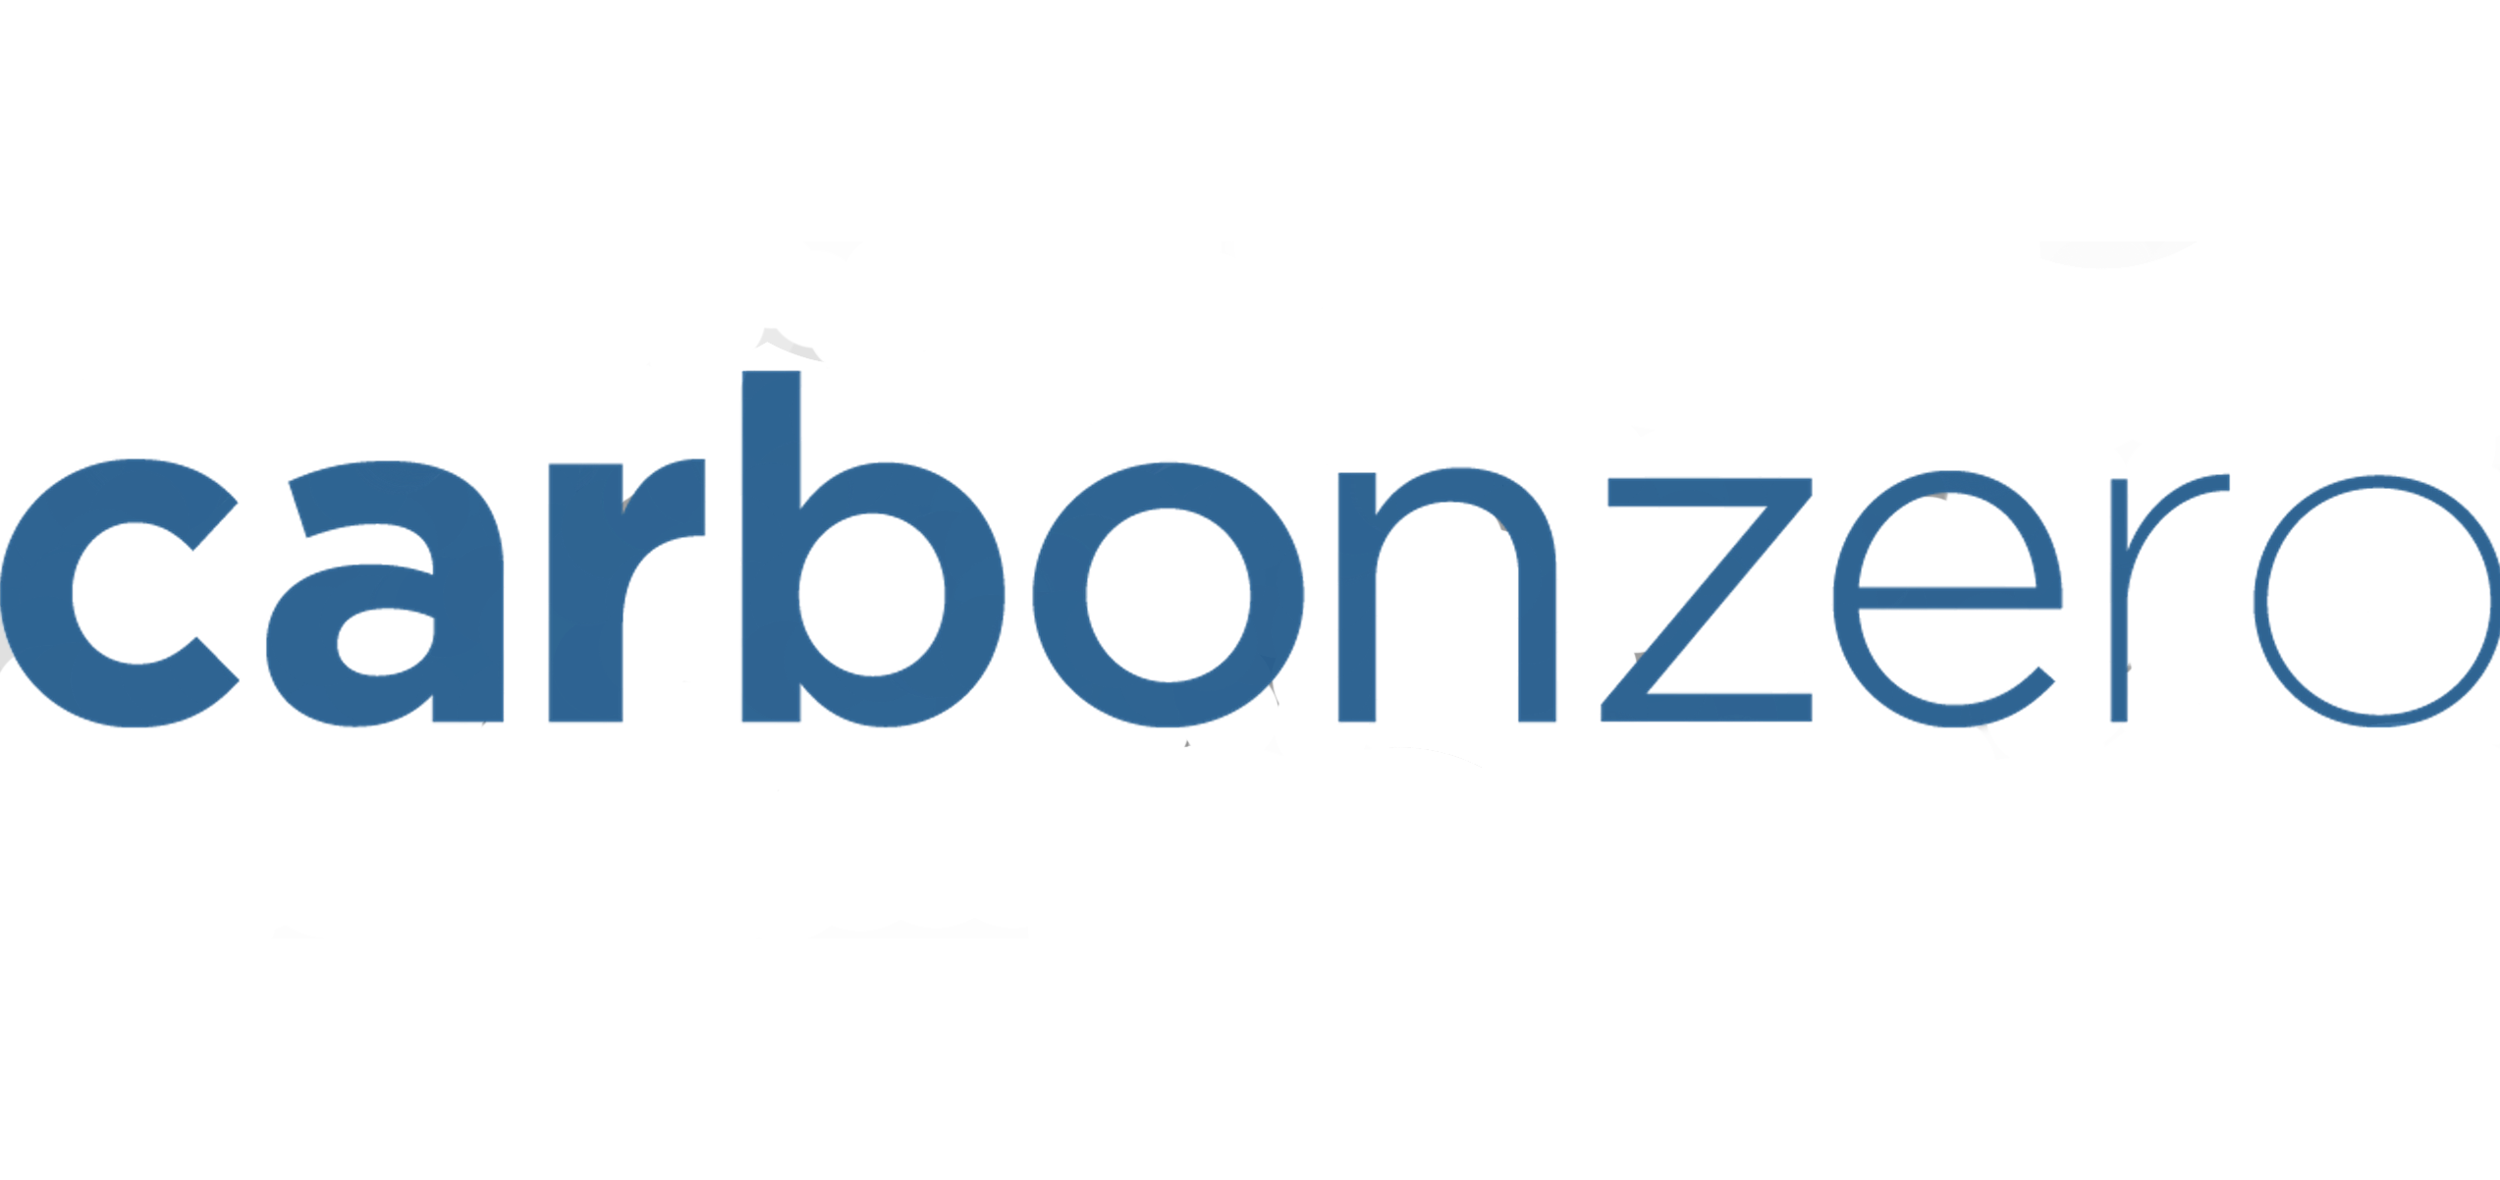 CarbonZero.png